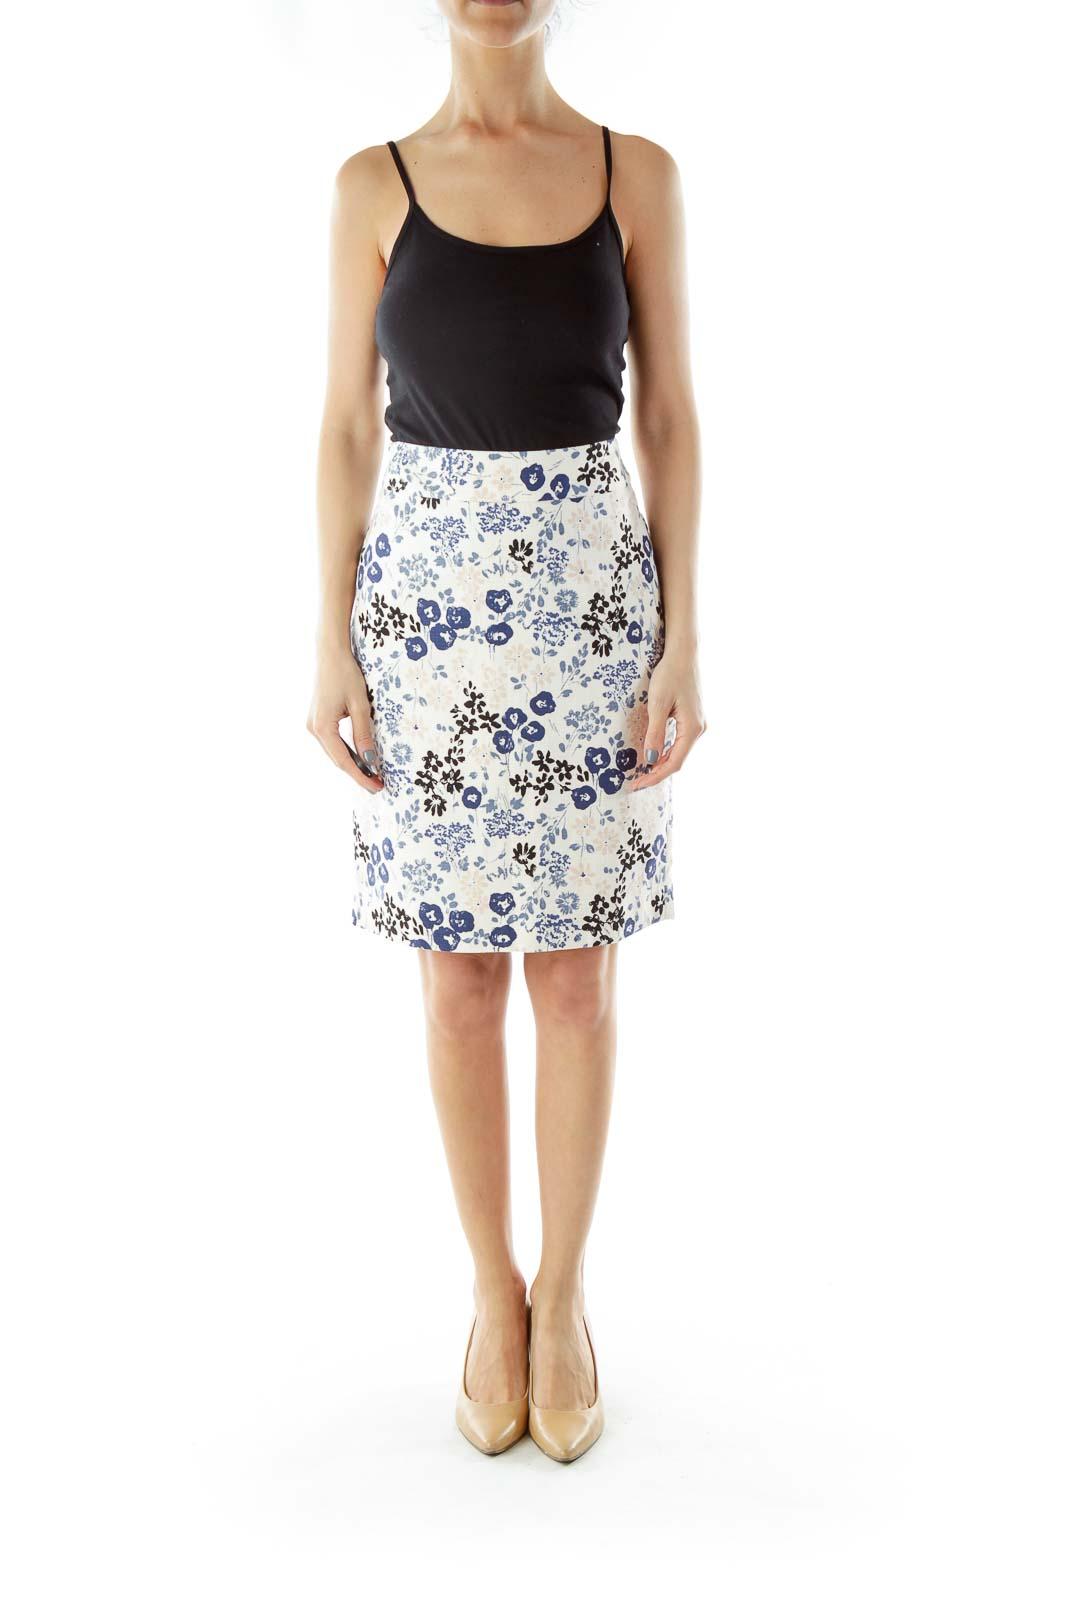 Cream Floral Pencil Skirt